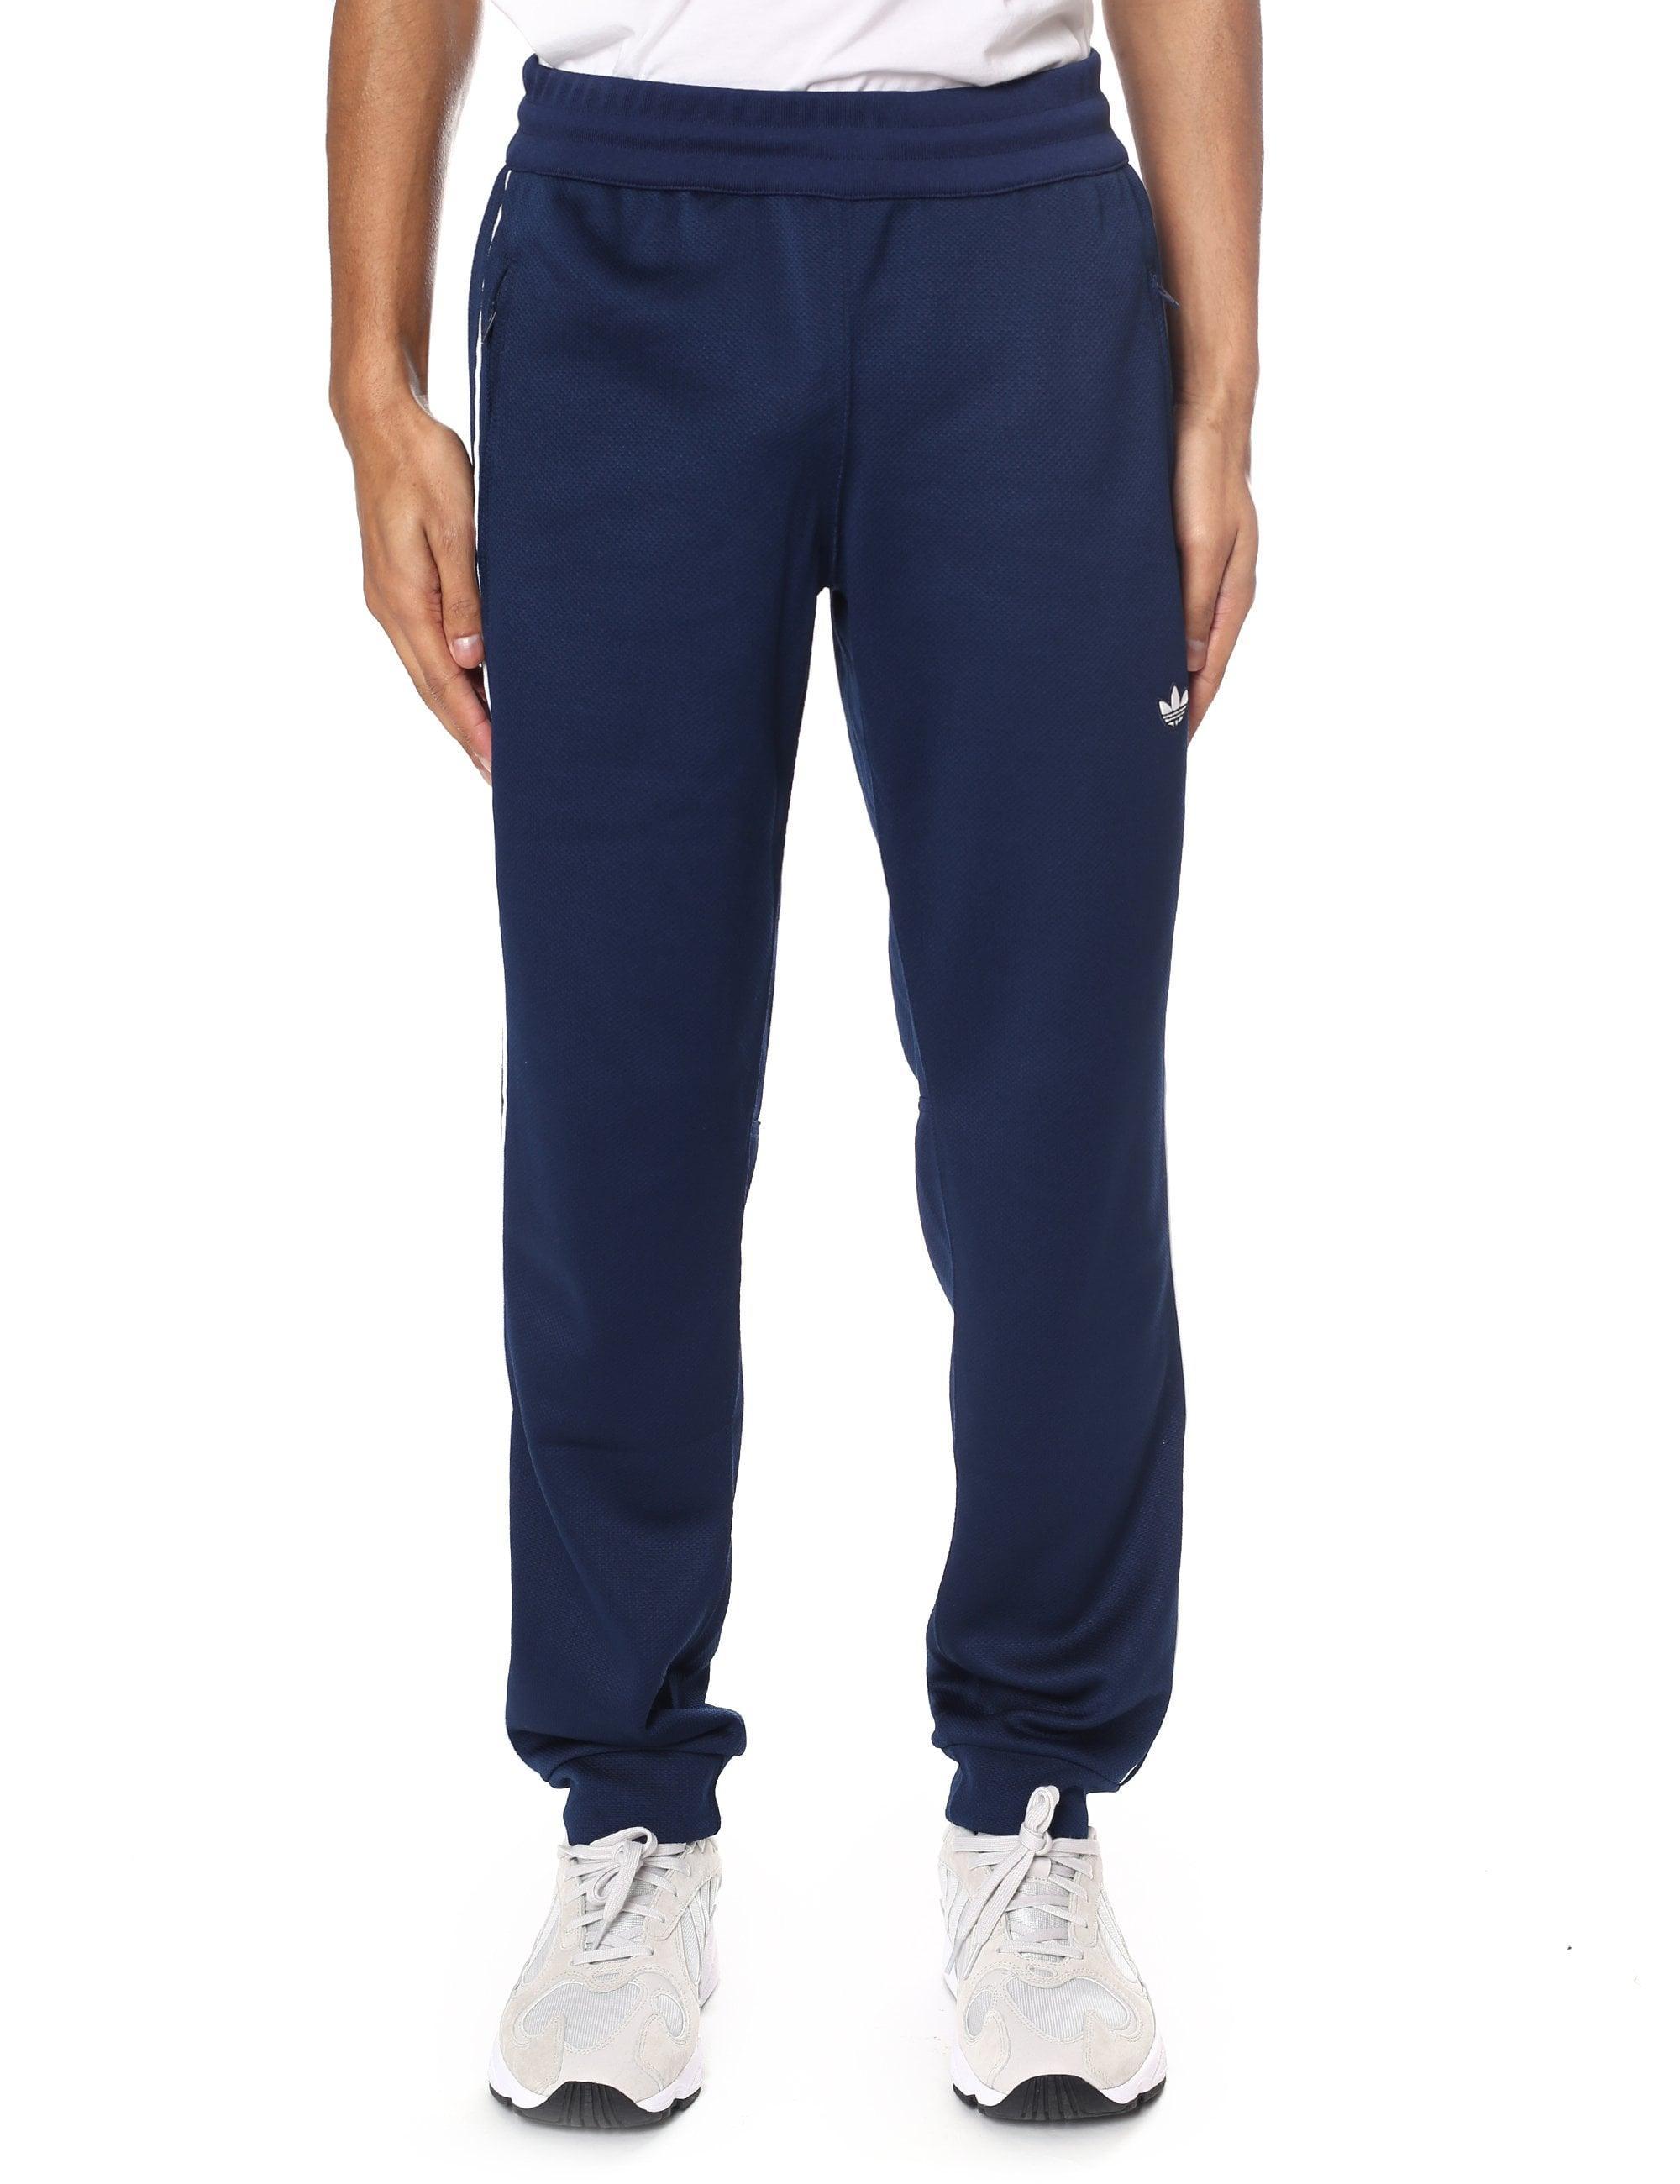 size 40 9eca1 df31c adidas. Mens Blue Arena Track Trousers